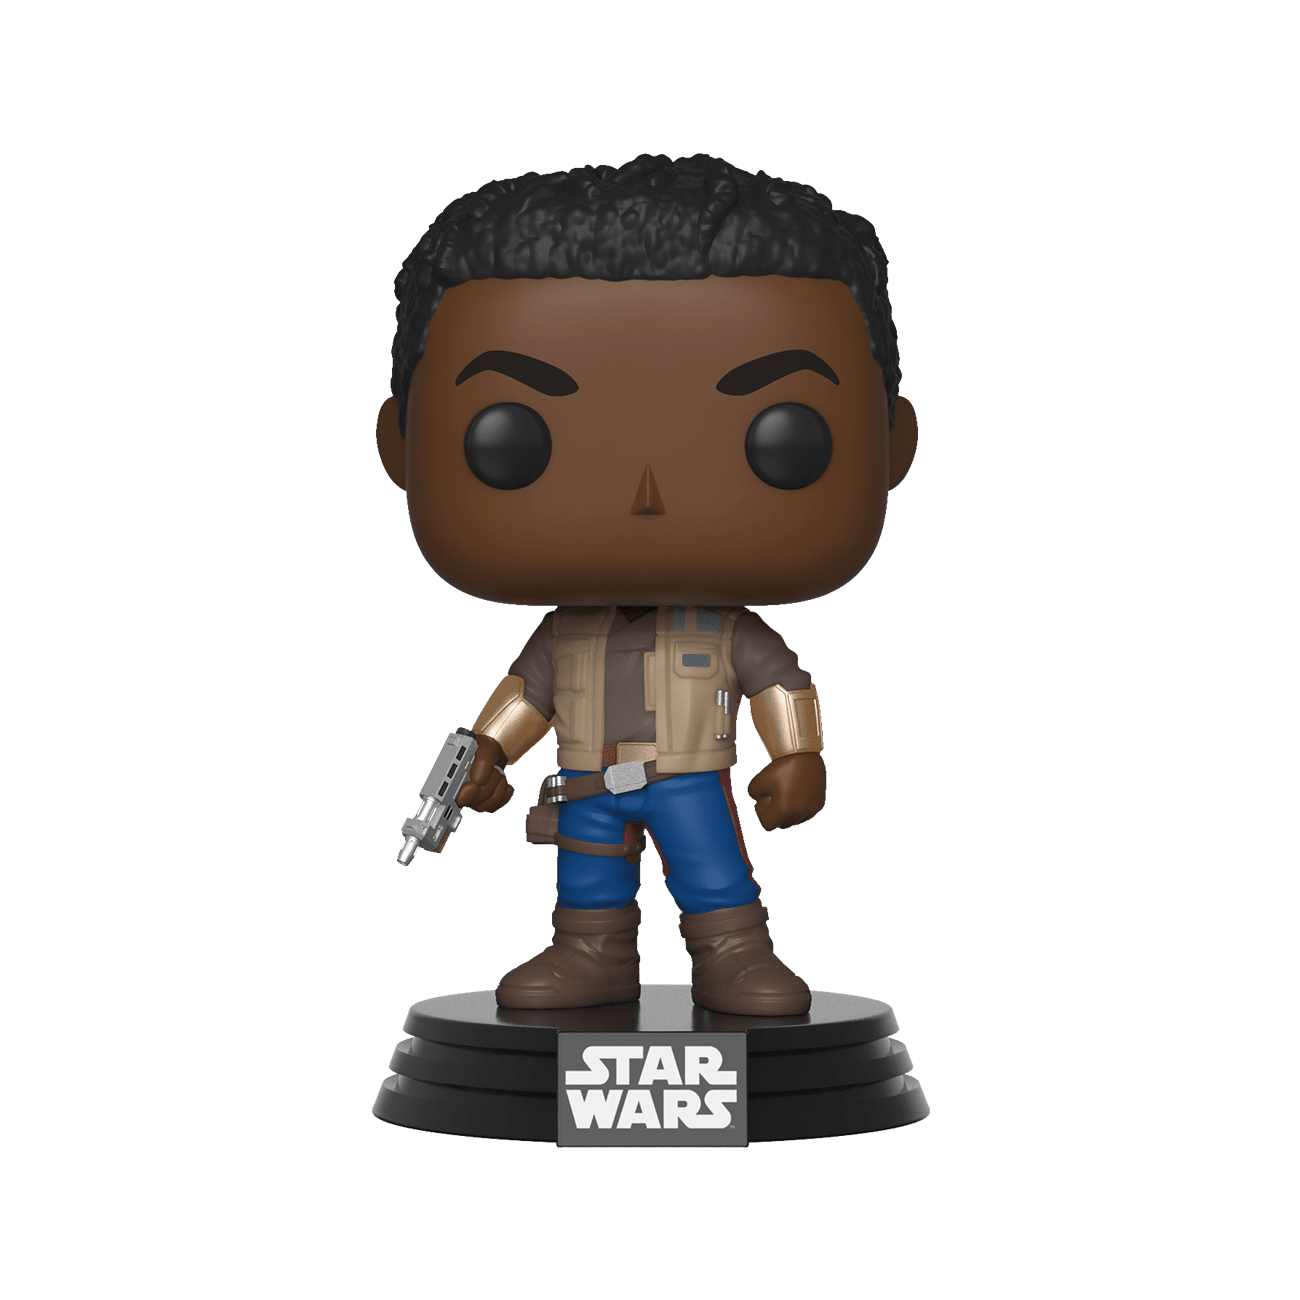 Star Wars: The Rise of Skywalker Finn Pop!  Vinyl Figure